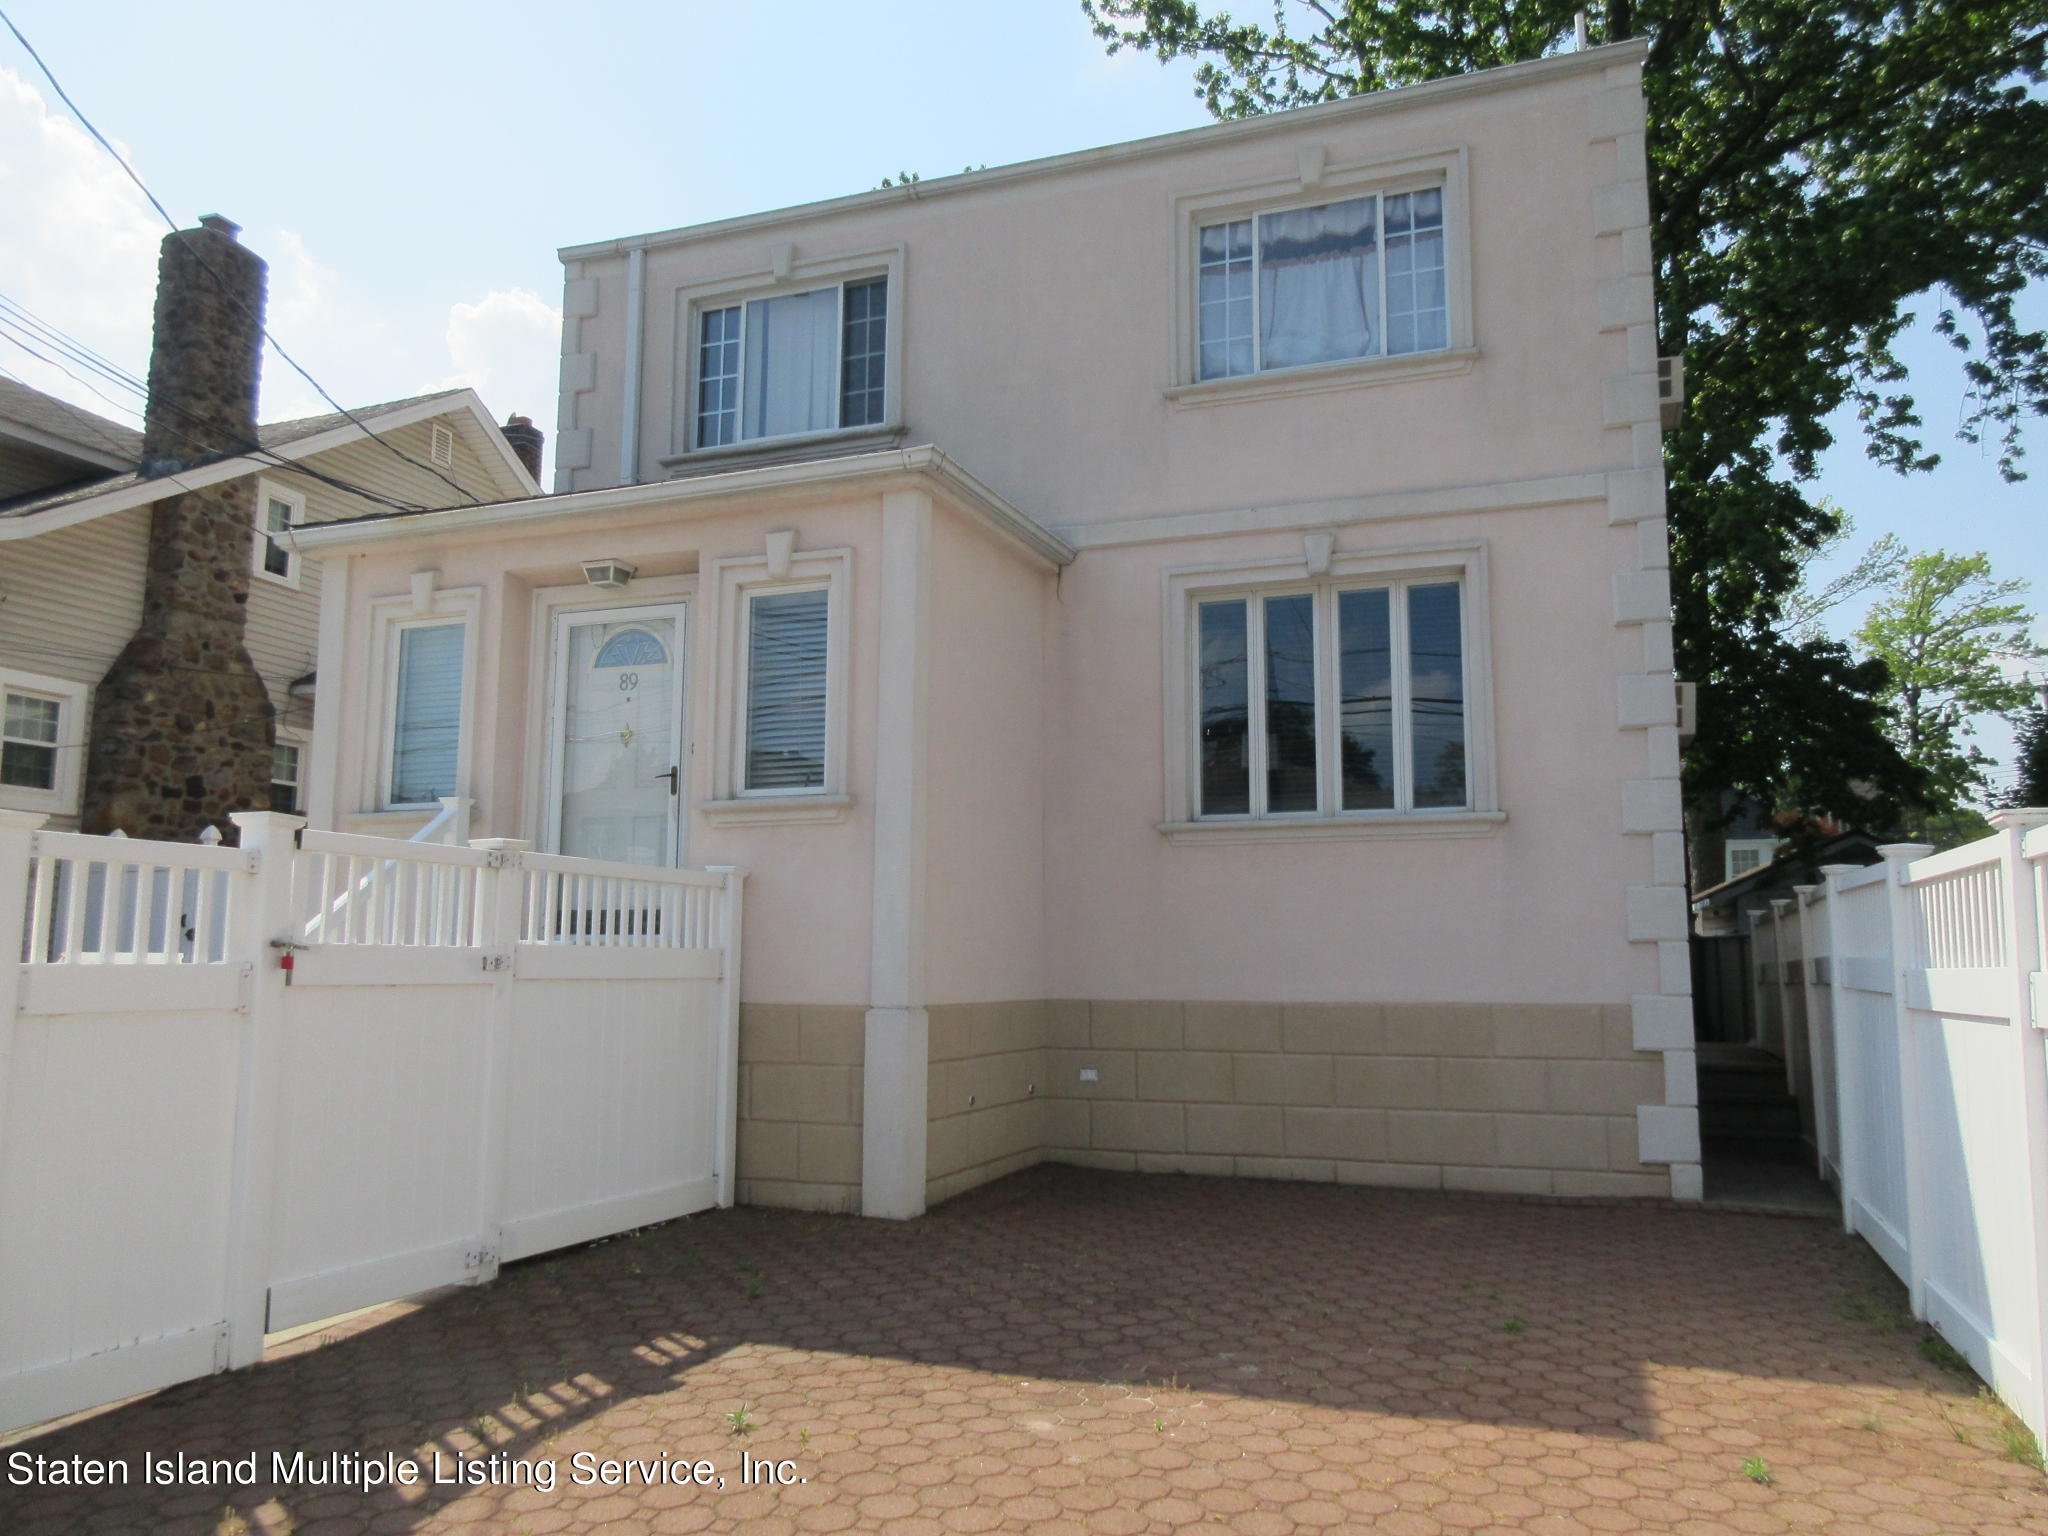 Two Family - Detached 89-91 David Street  Staten Island, NY 10308, MLS-1146516-3